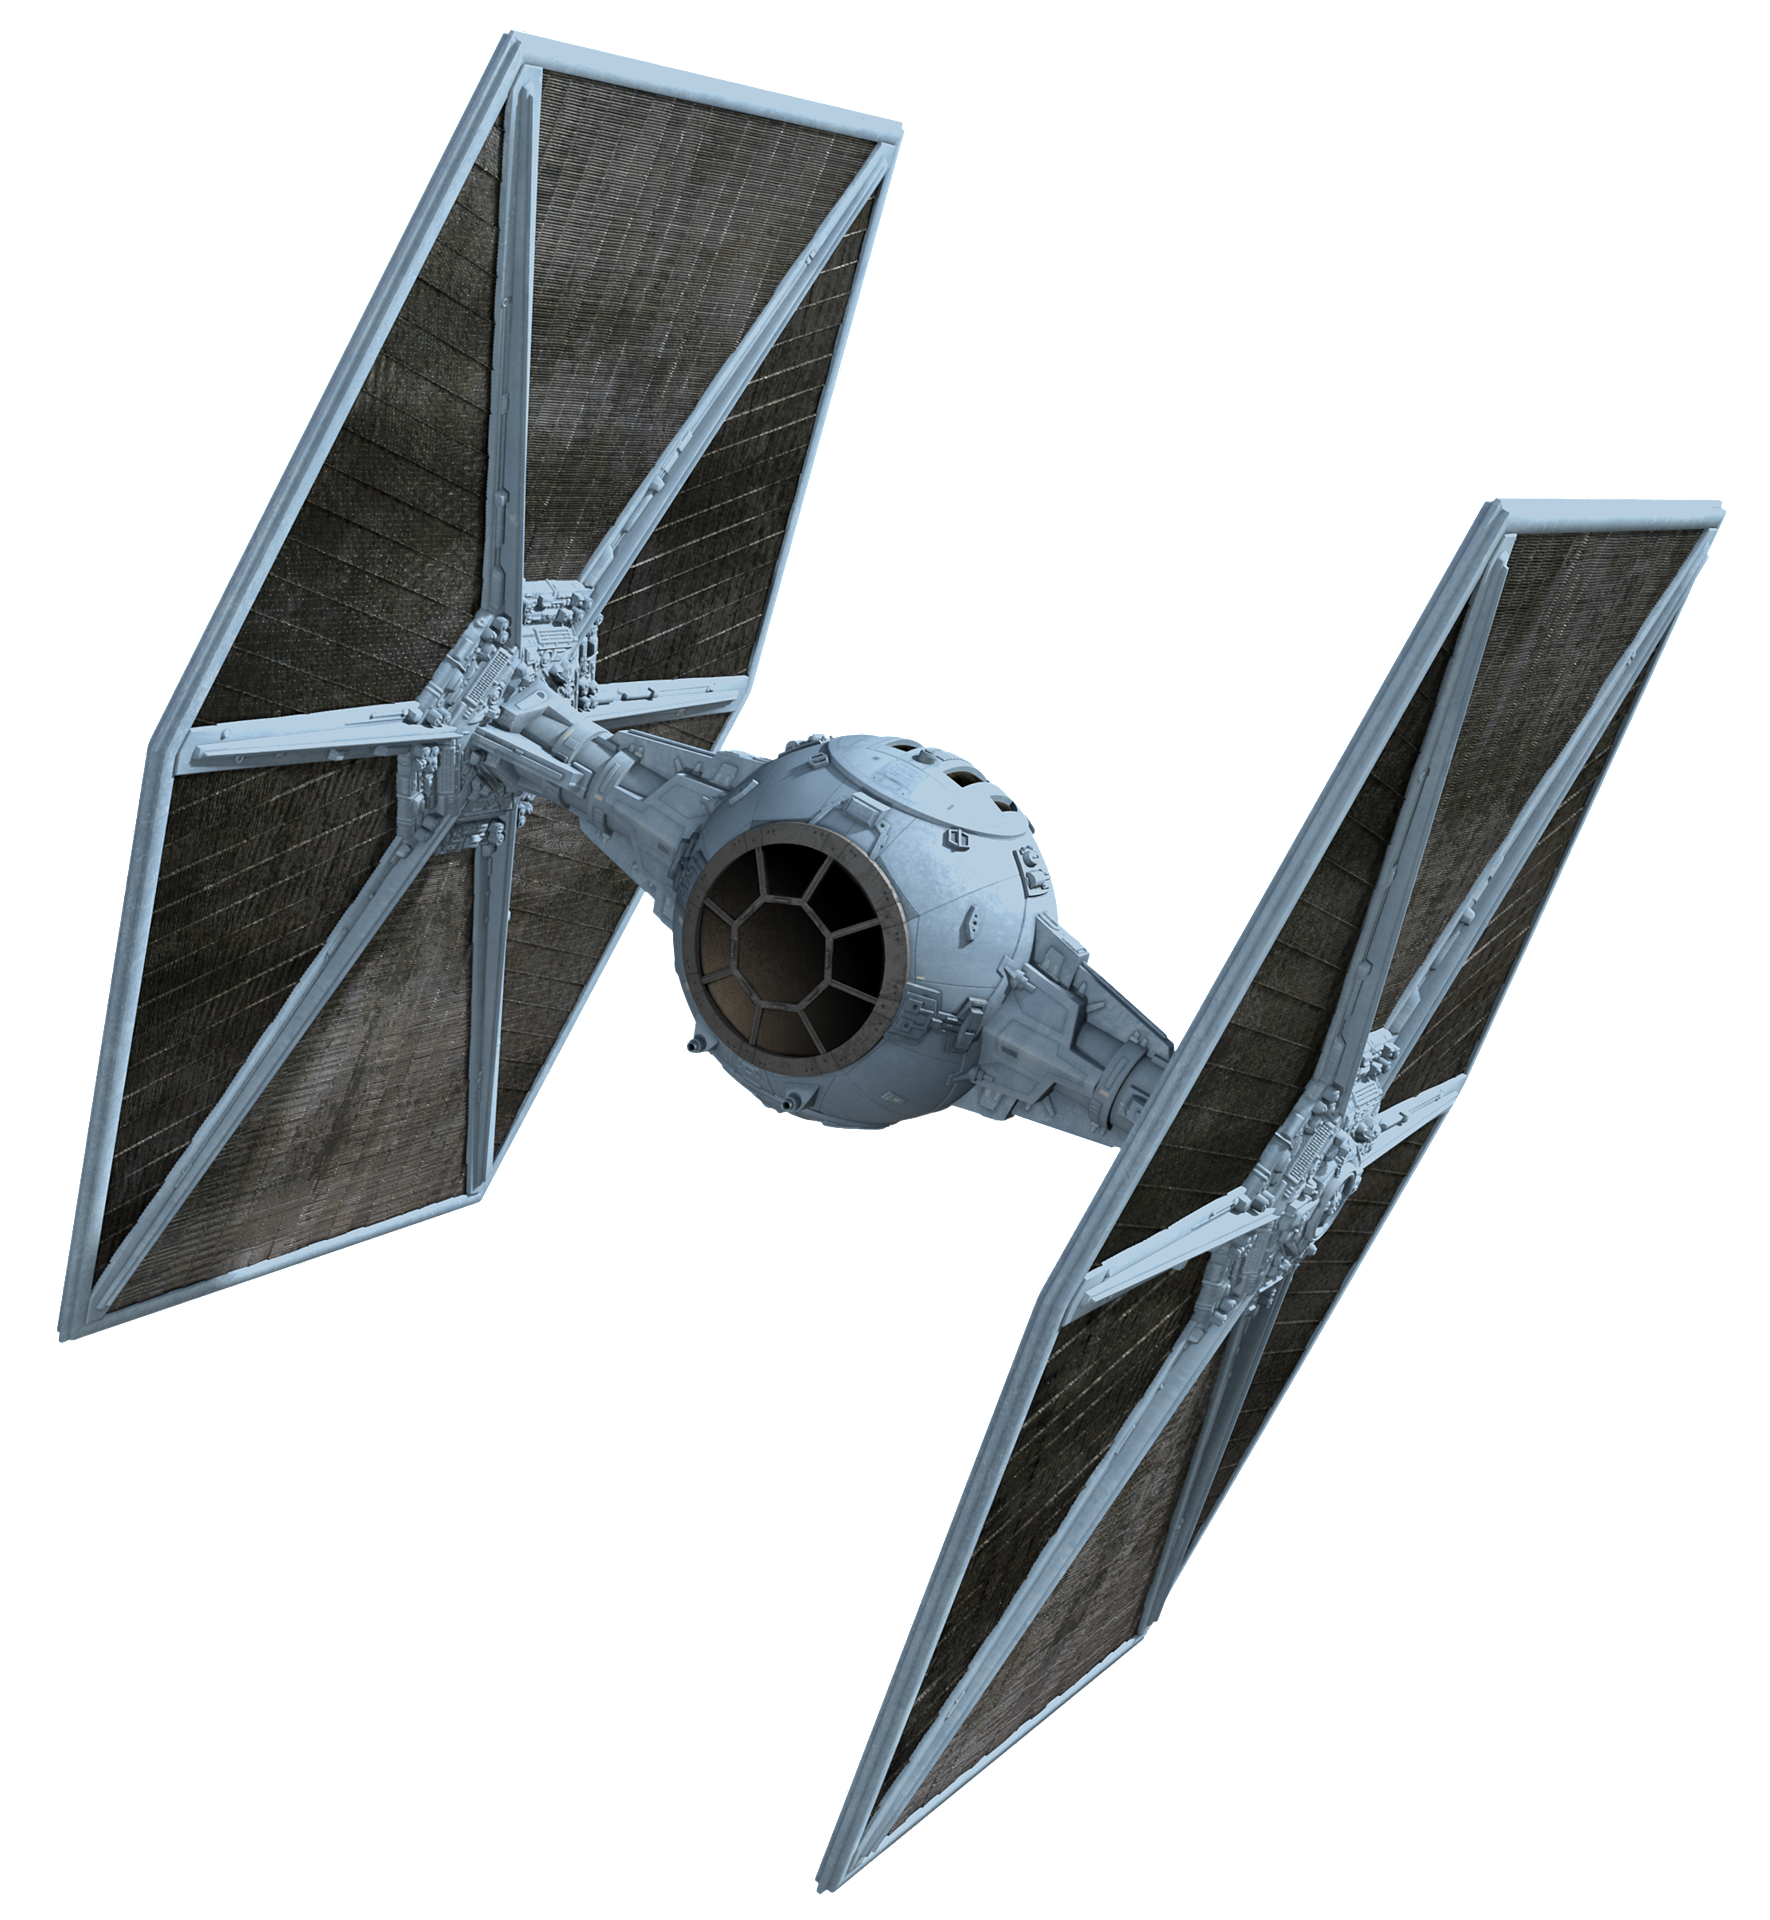 Star Wars Tie Fighter Fathead Star Wars Ships Star Wars Vehicles Star Wars Models